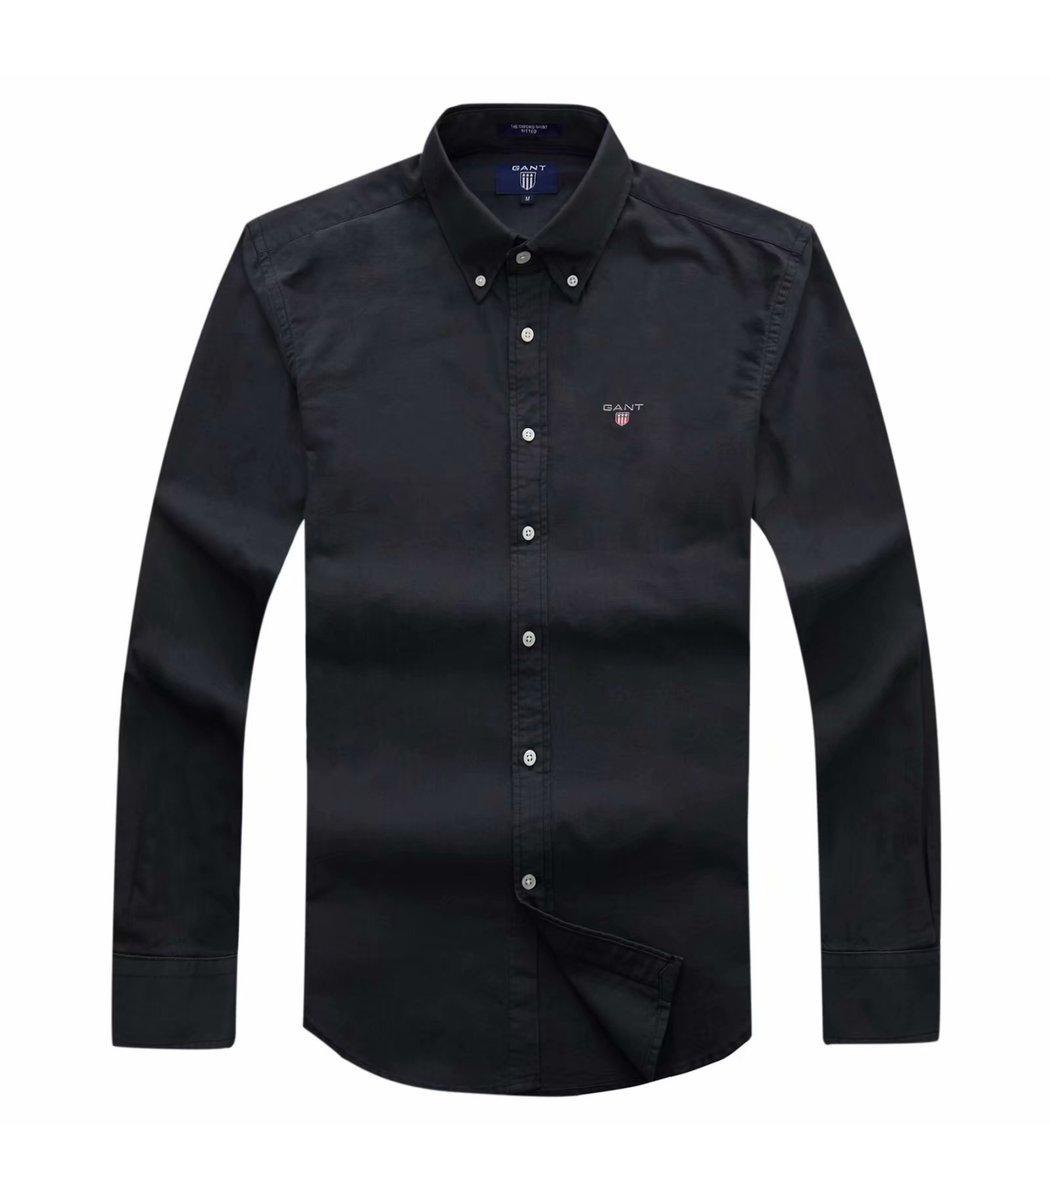 Черная рубашка GANT RG2